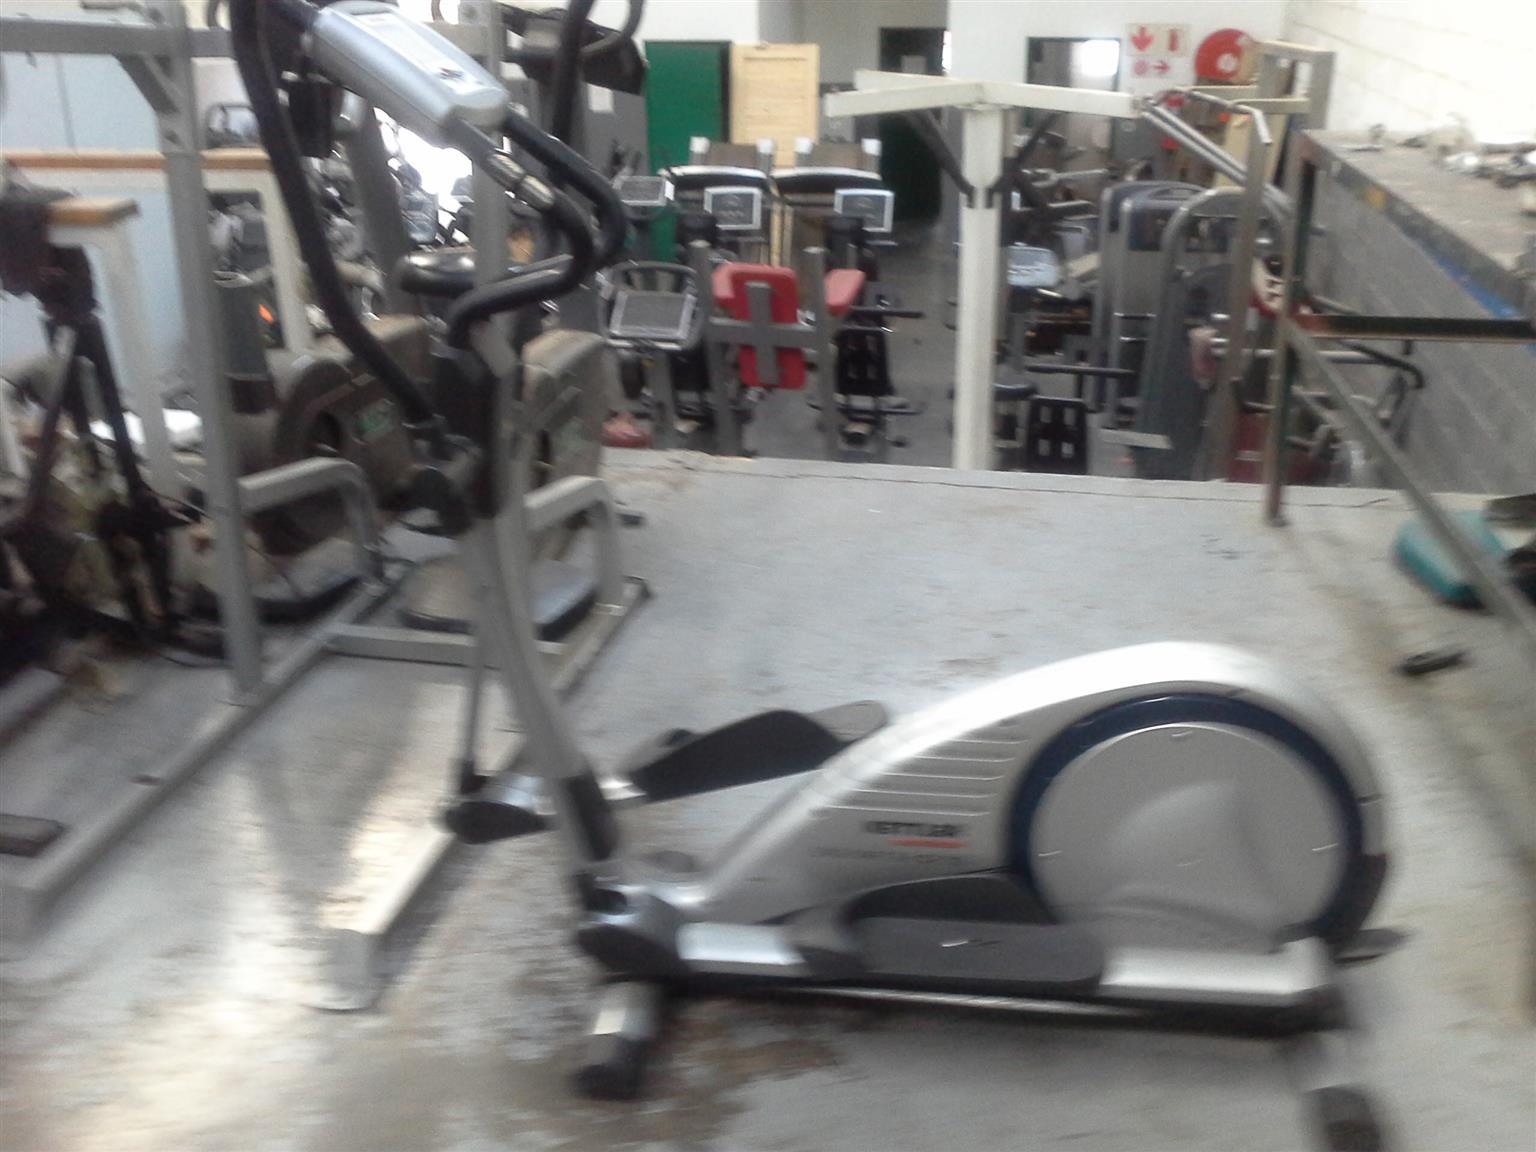 Gym equipment, service, repairs, maintenance, refurbished and upholstry.